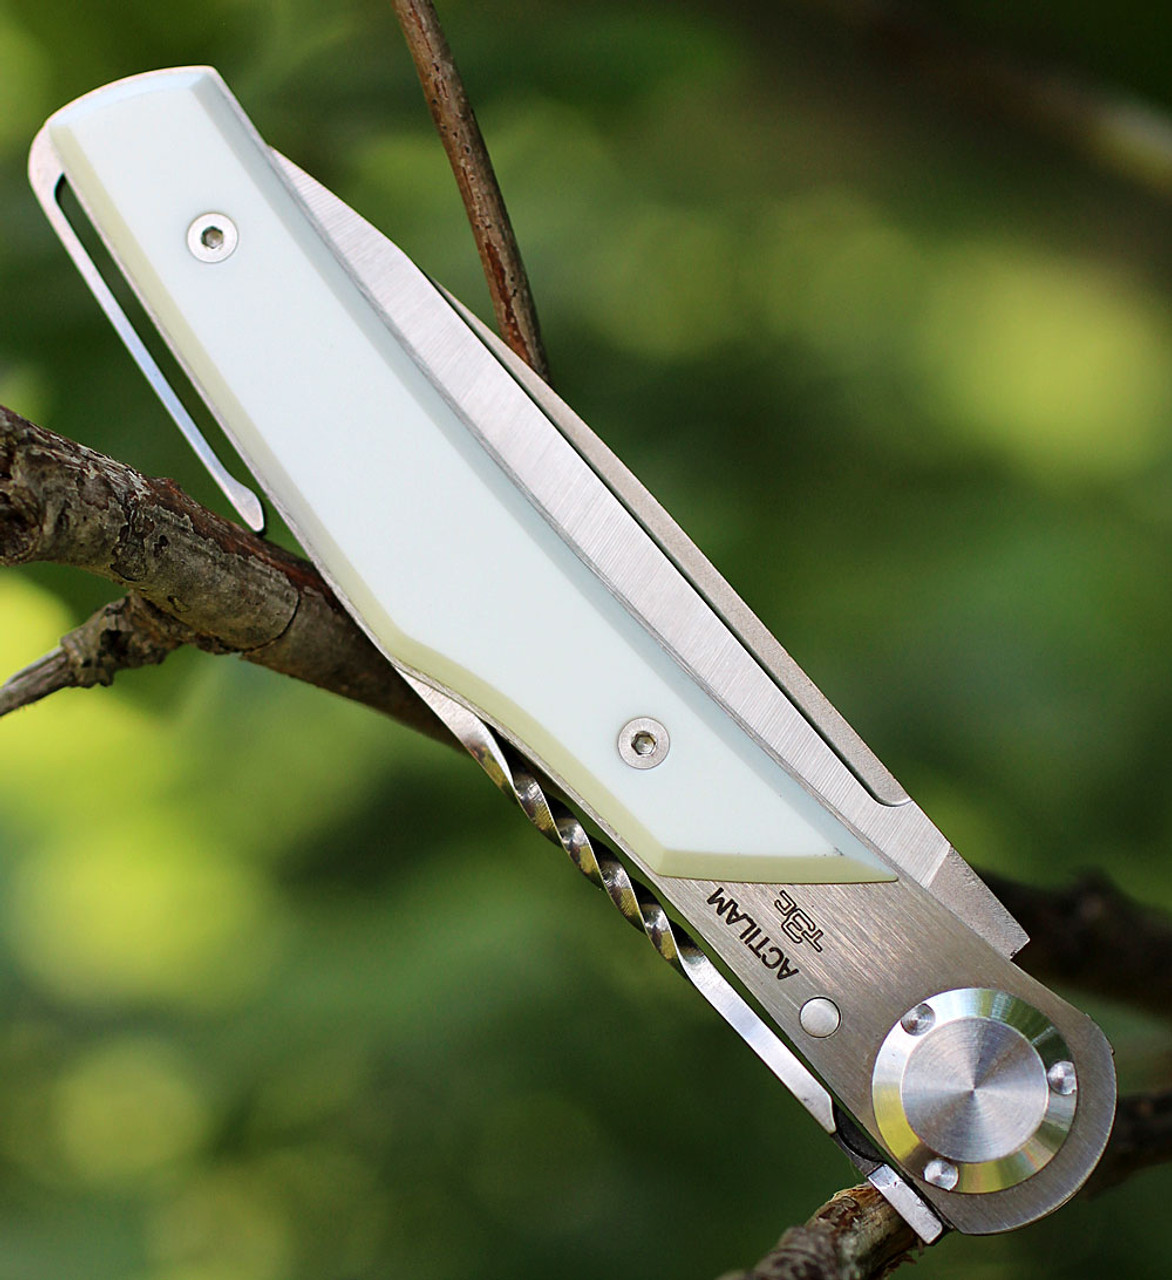 Actilam T3CC White Corian Folder with Clip, 3.25 in. X50CrMoV15N Plain Blade